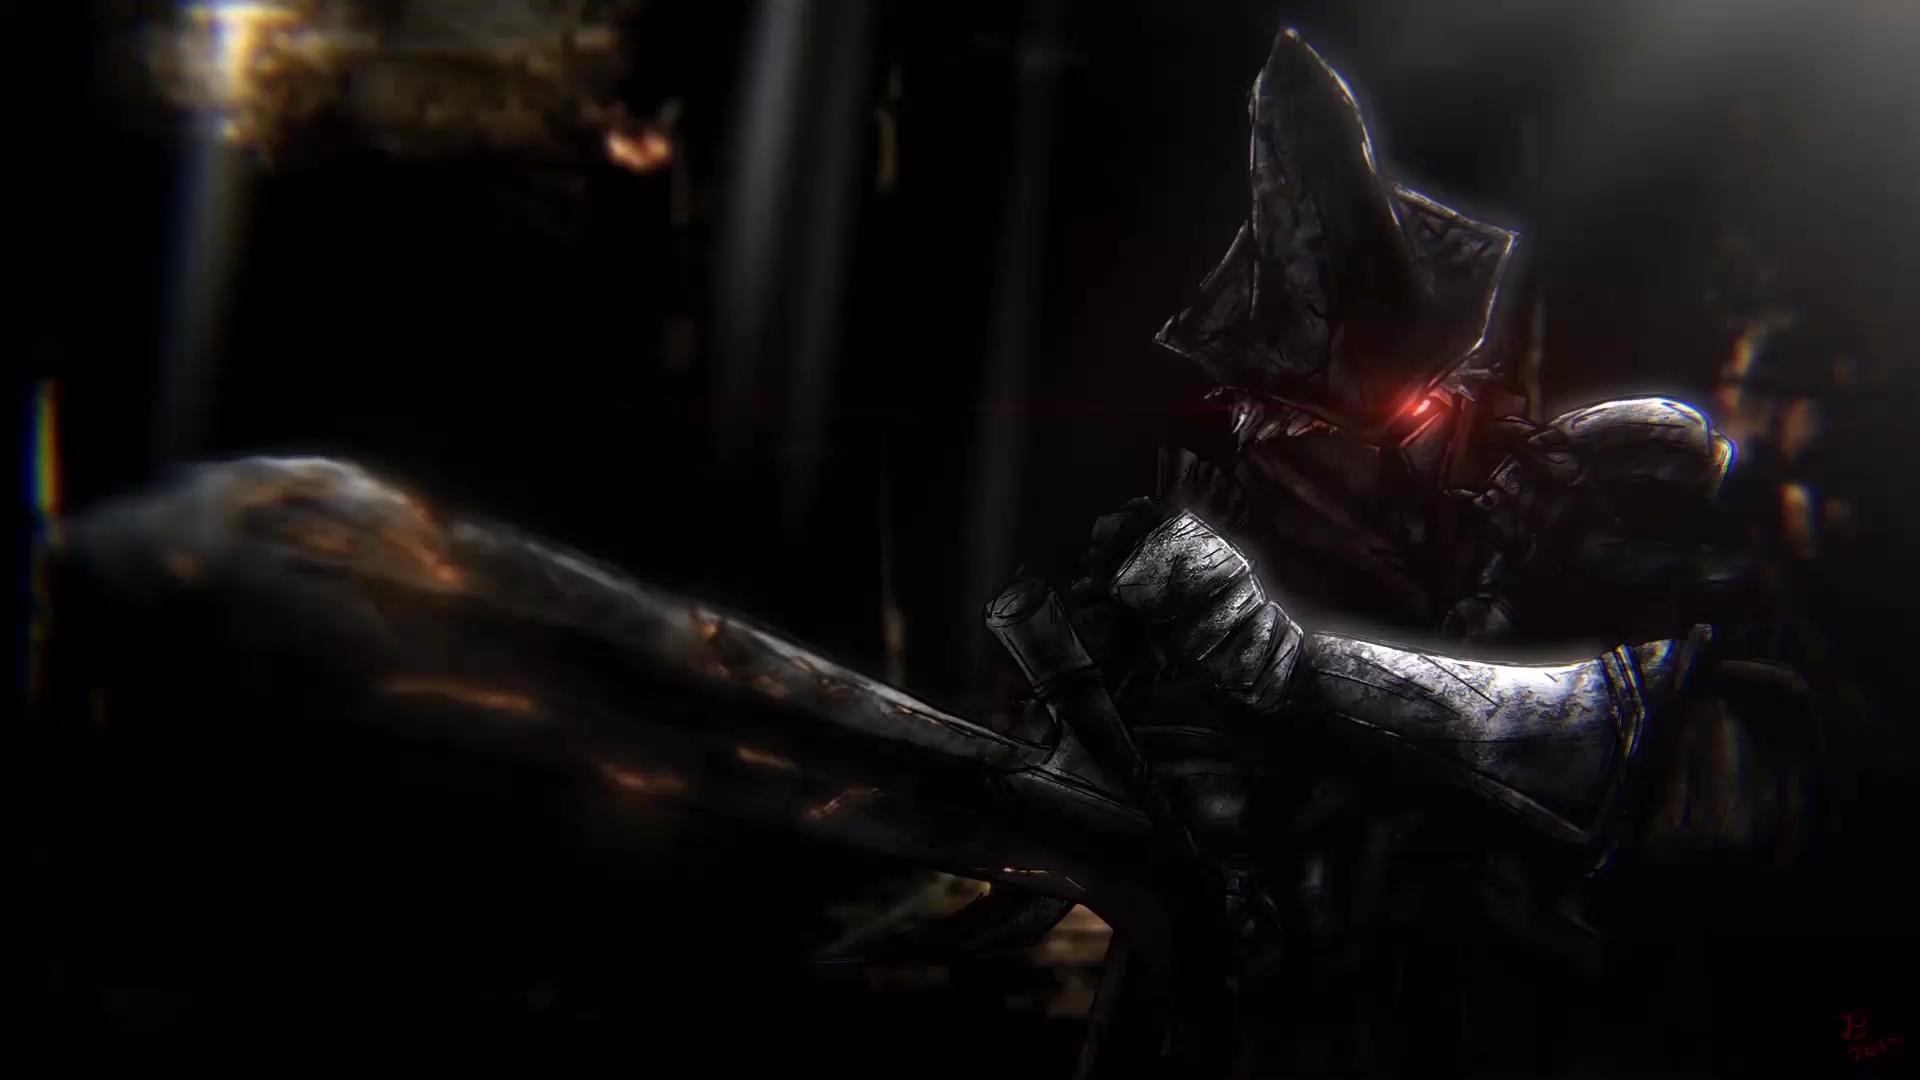 Dark Souls 3 Abyss Watcher Live Wallpaper Wallpaperwaifu